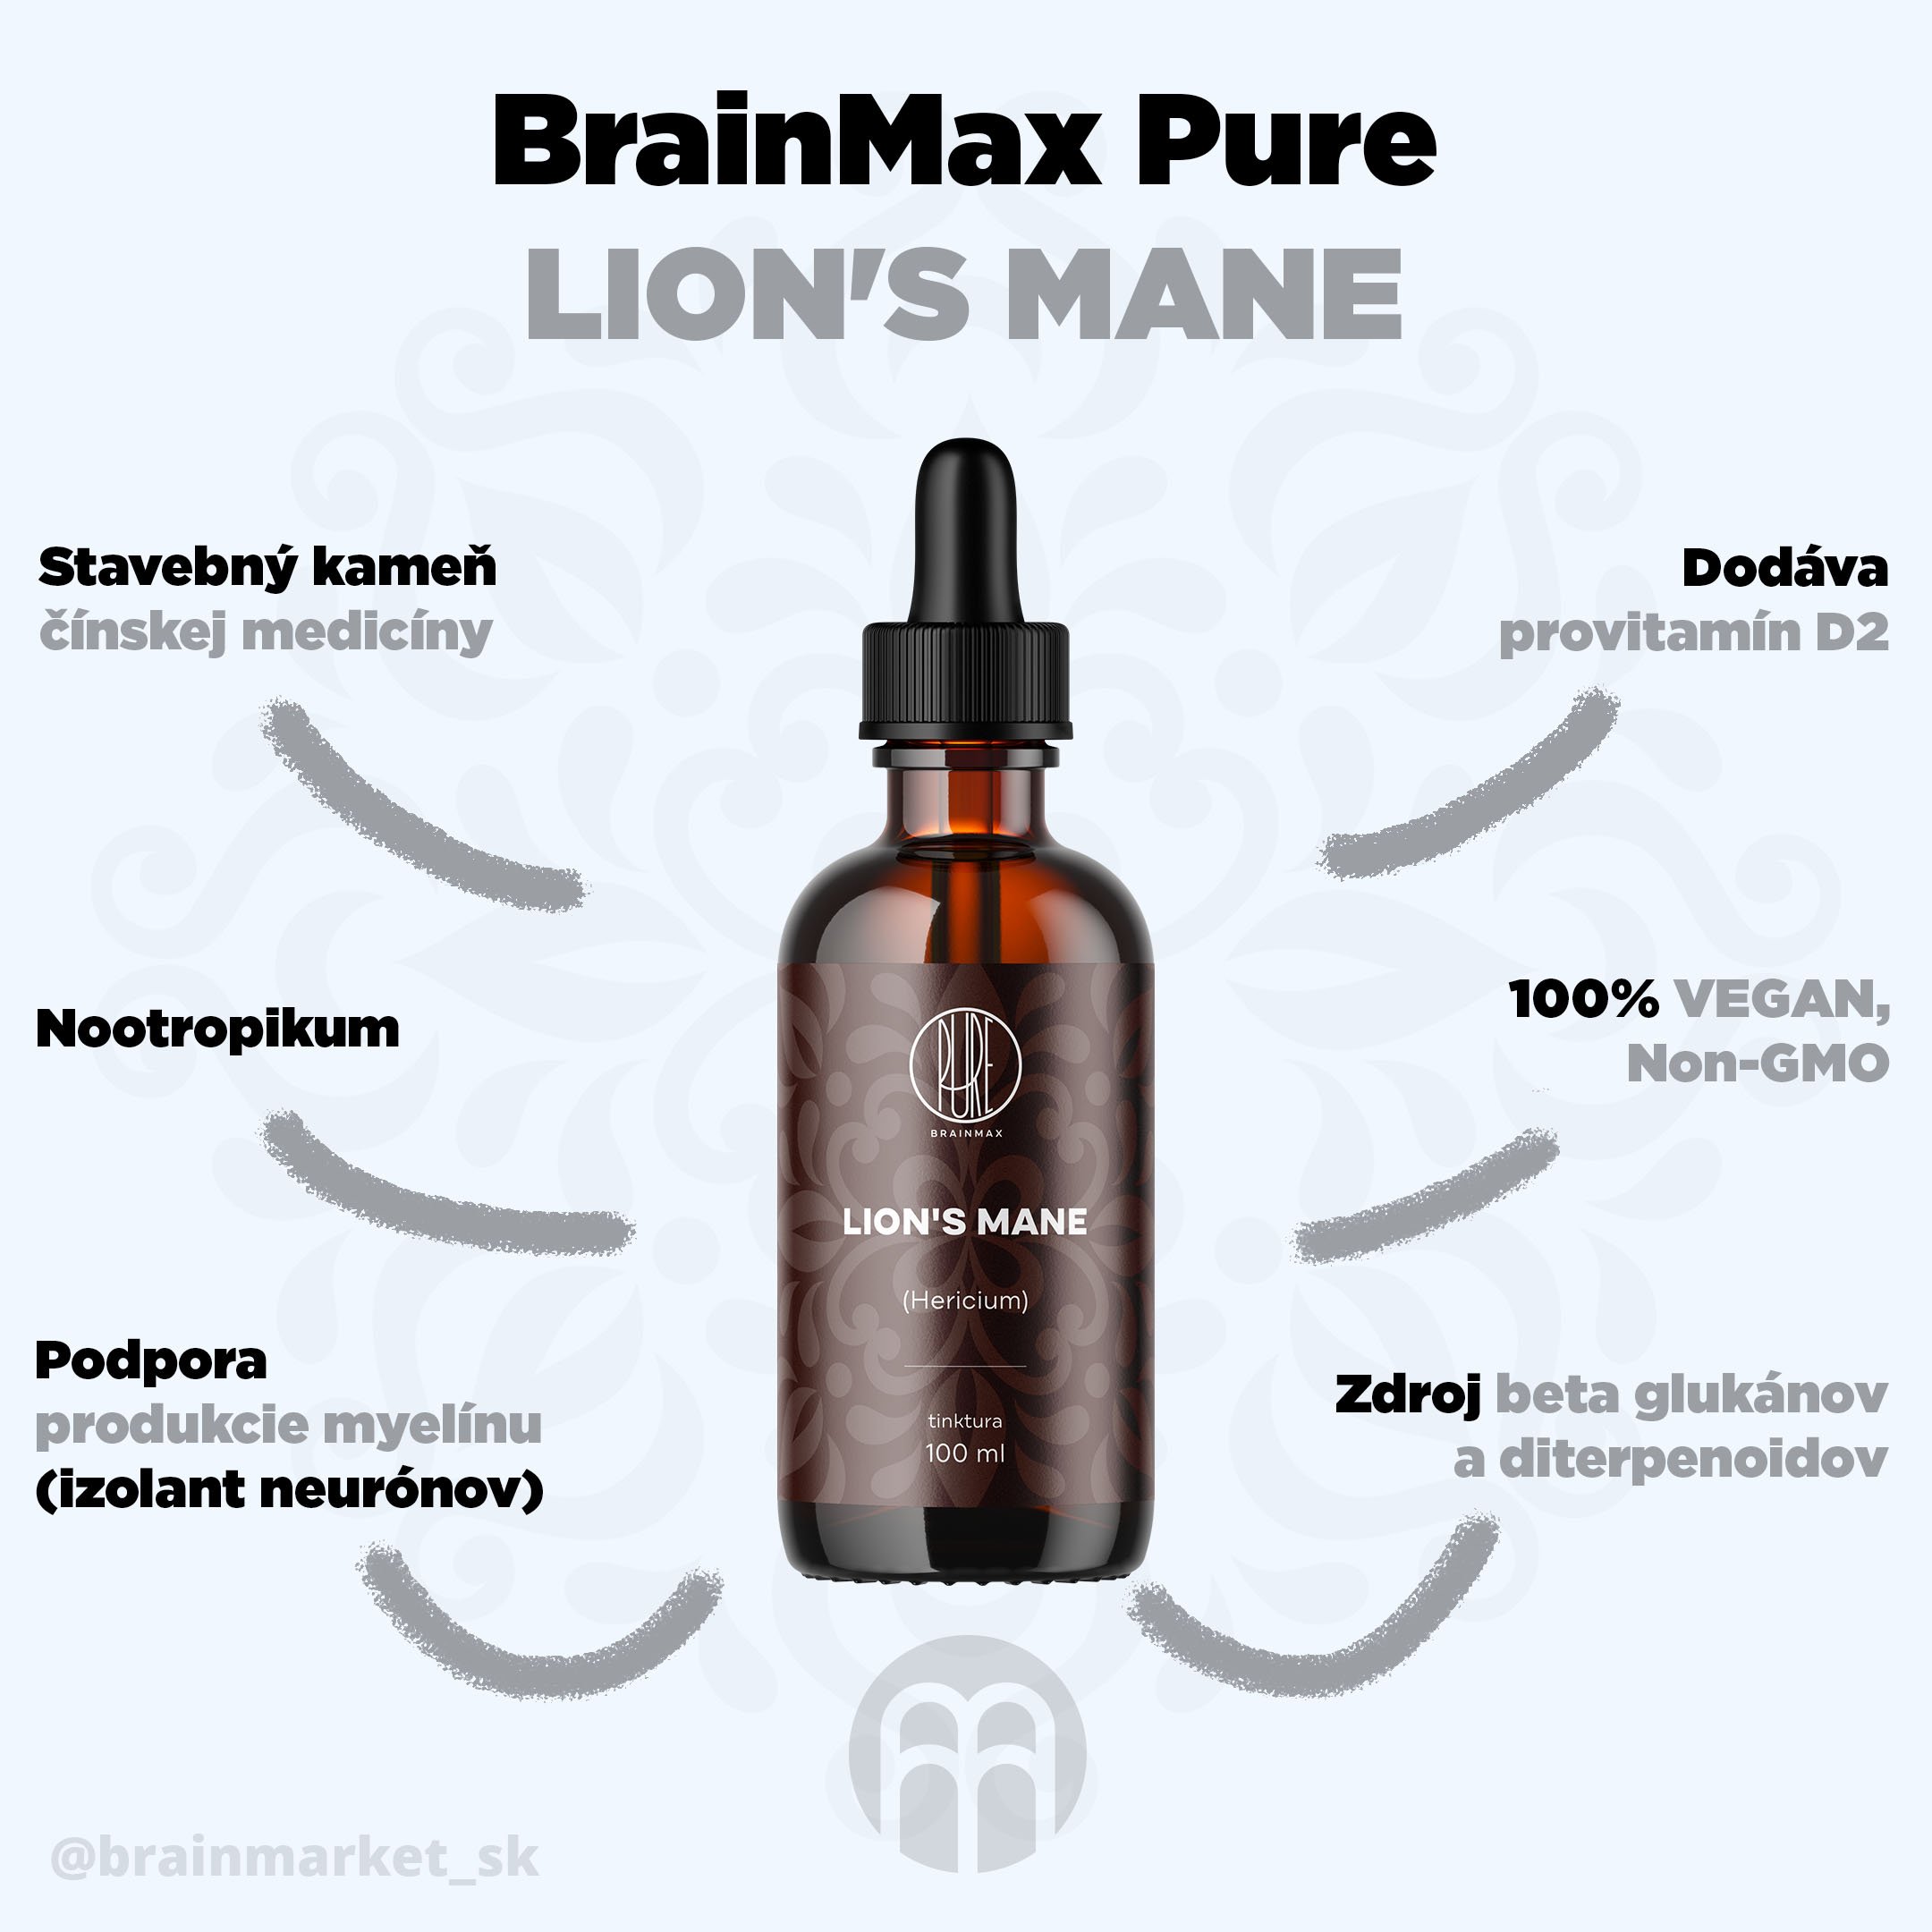 lions_mane_infografika_brainmarket_sk